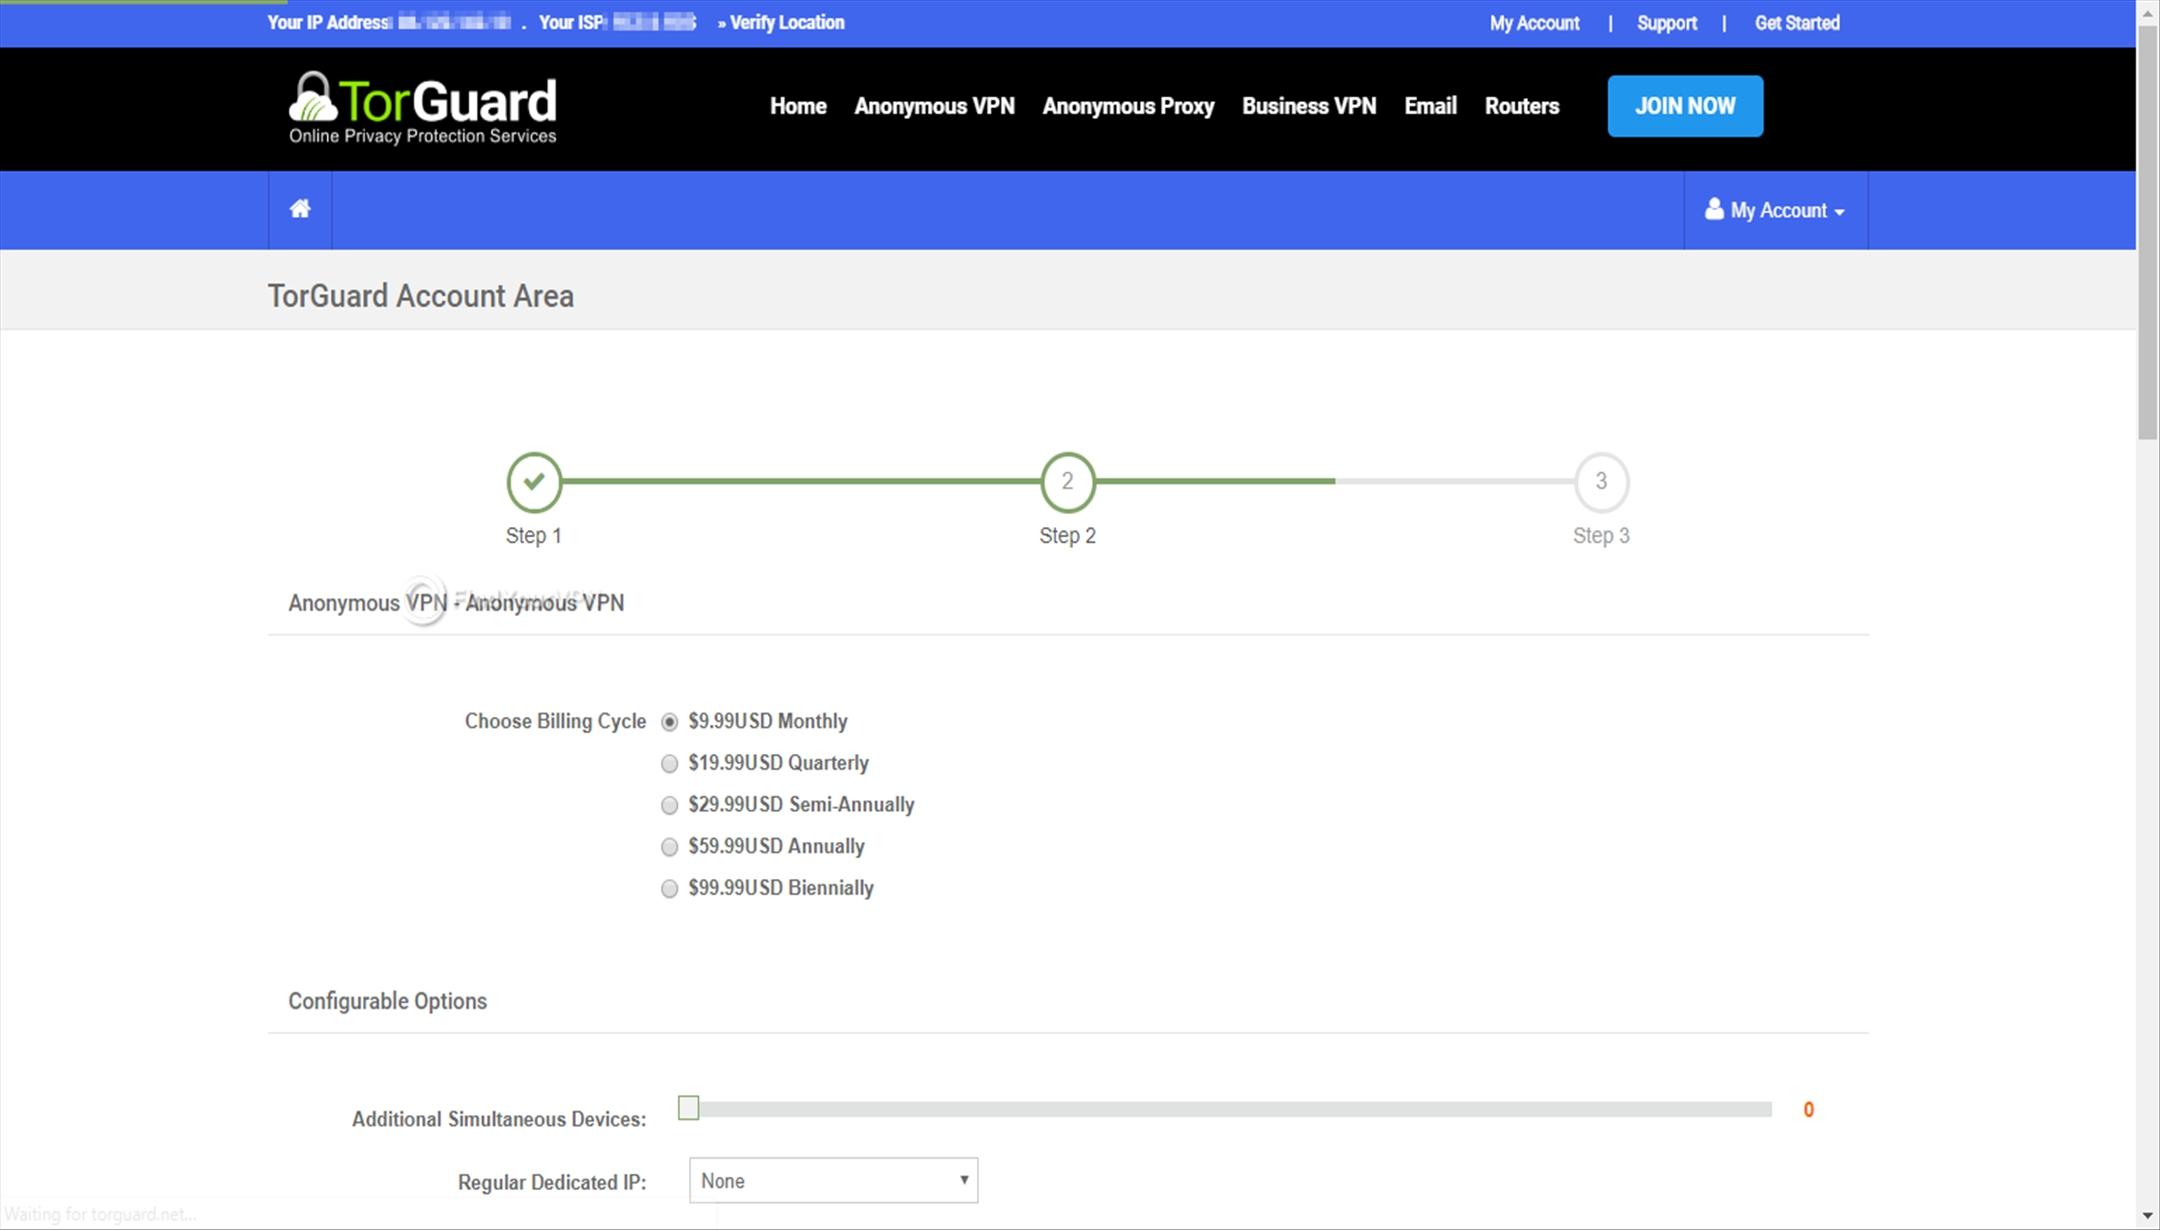 Multiple TorGuard subscription plans